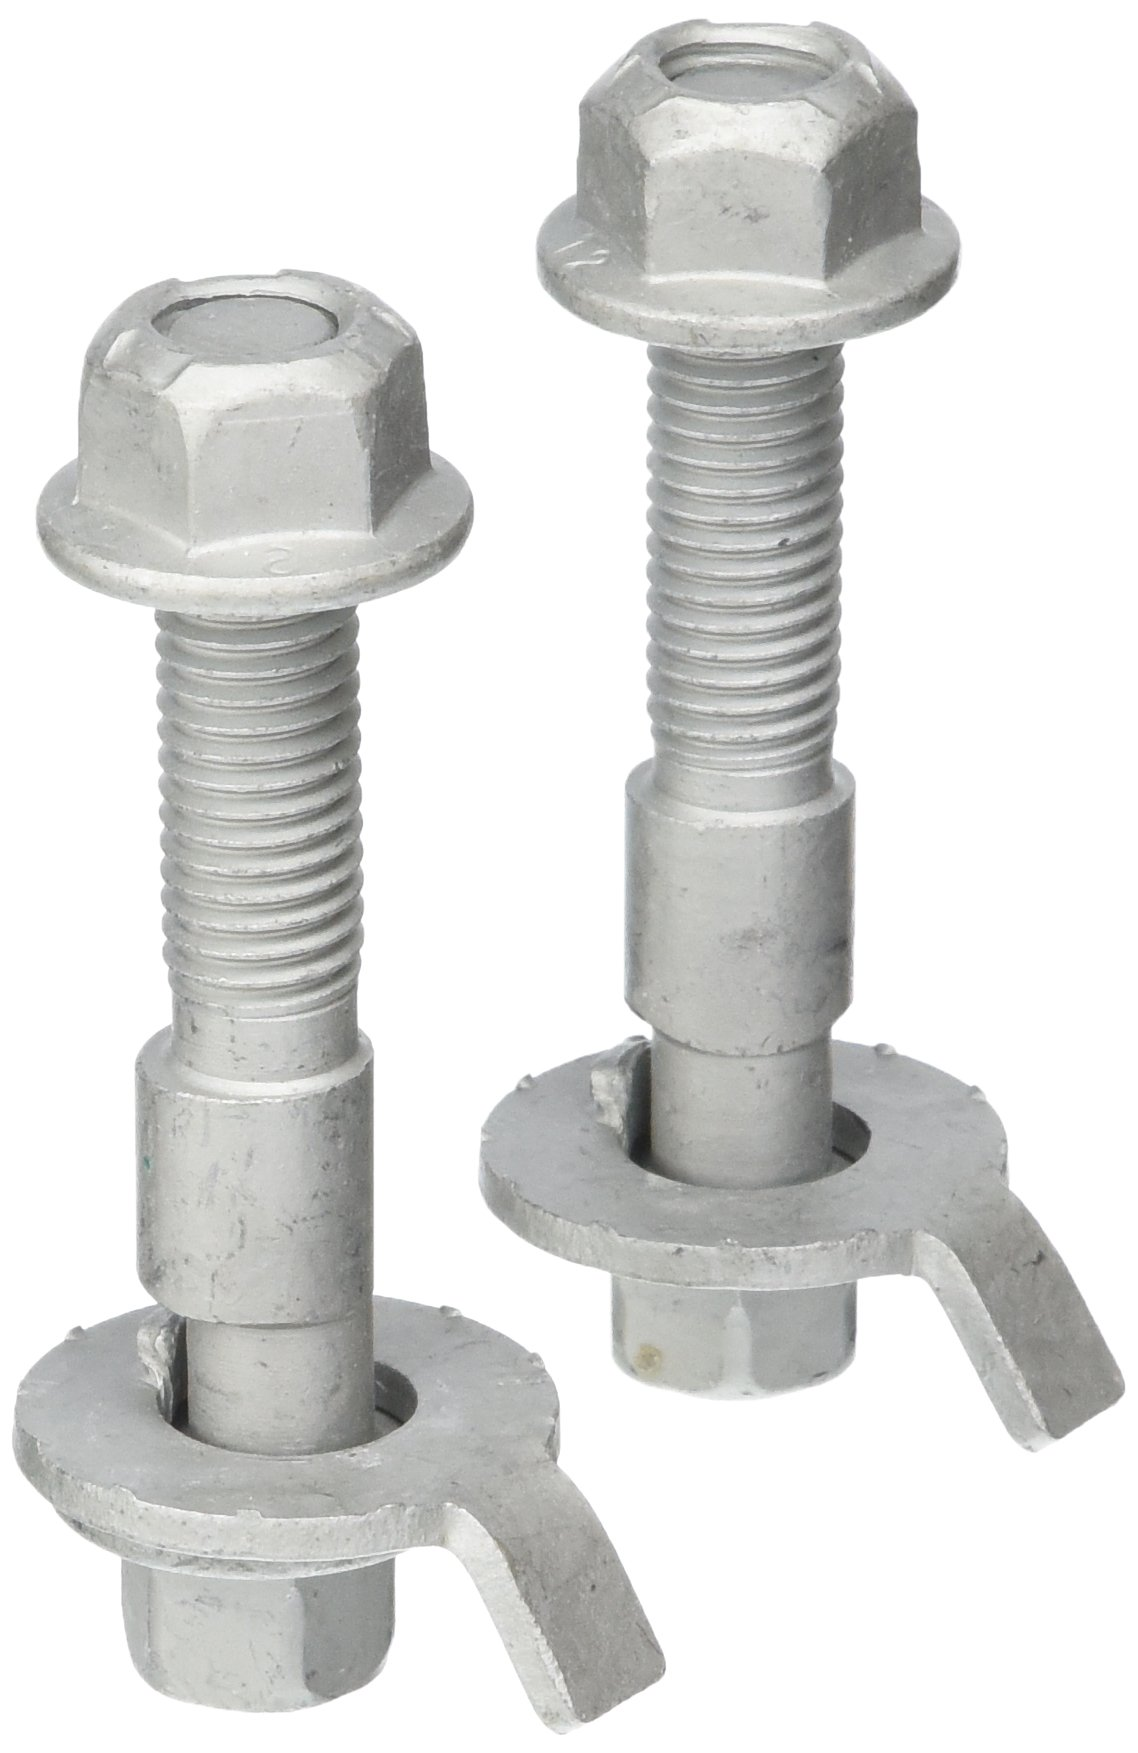 ST Suspension 57422 Front Camber Adjustment Kit